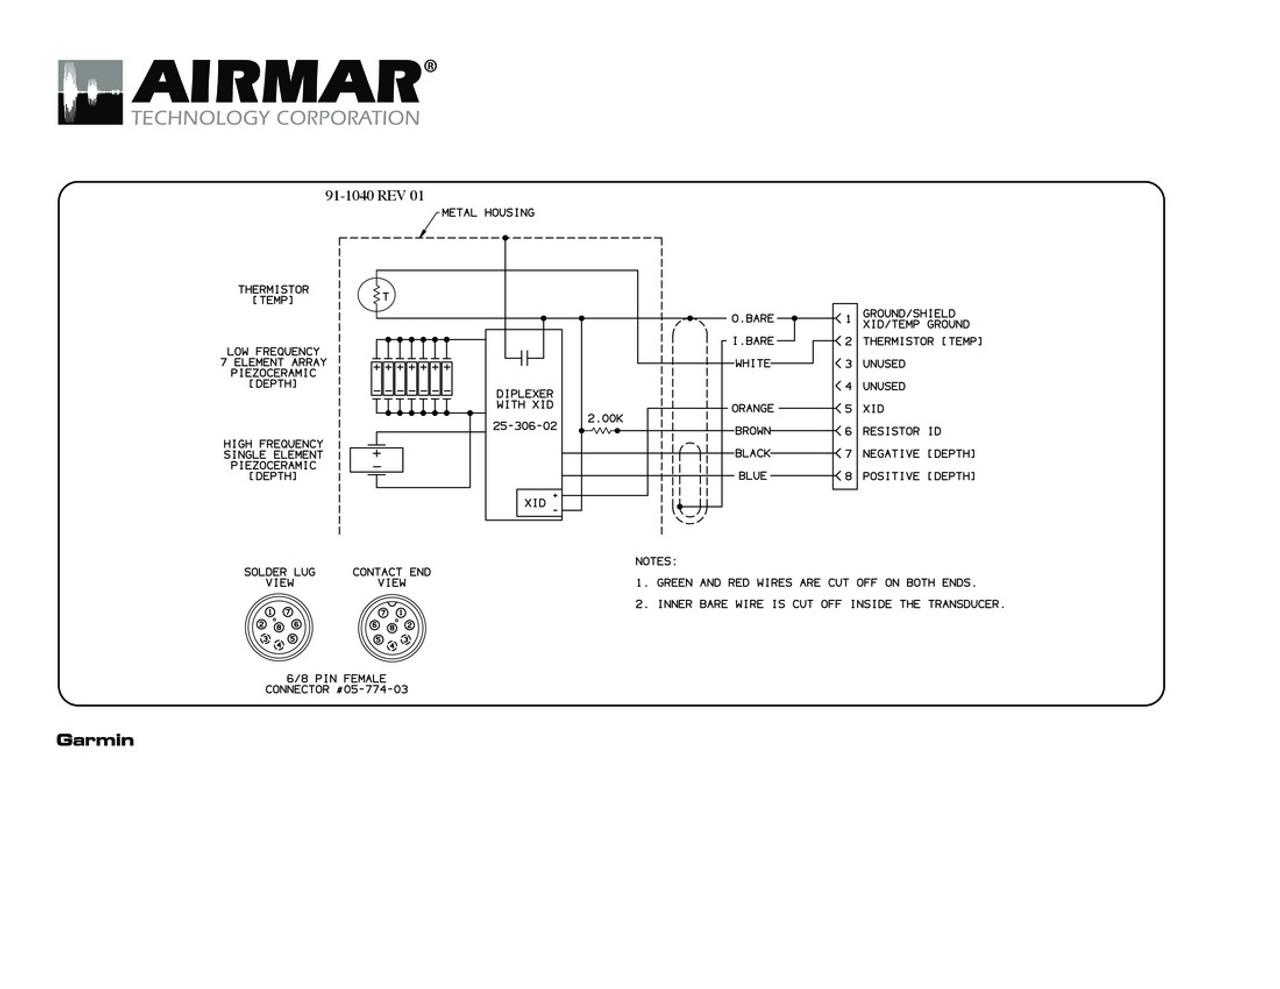 American Standard Furnace Model Twe036c140a1 Wiring Diagram